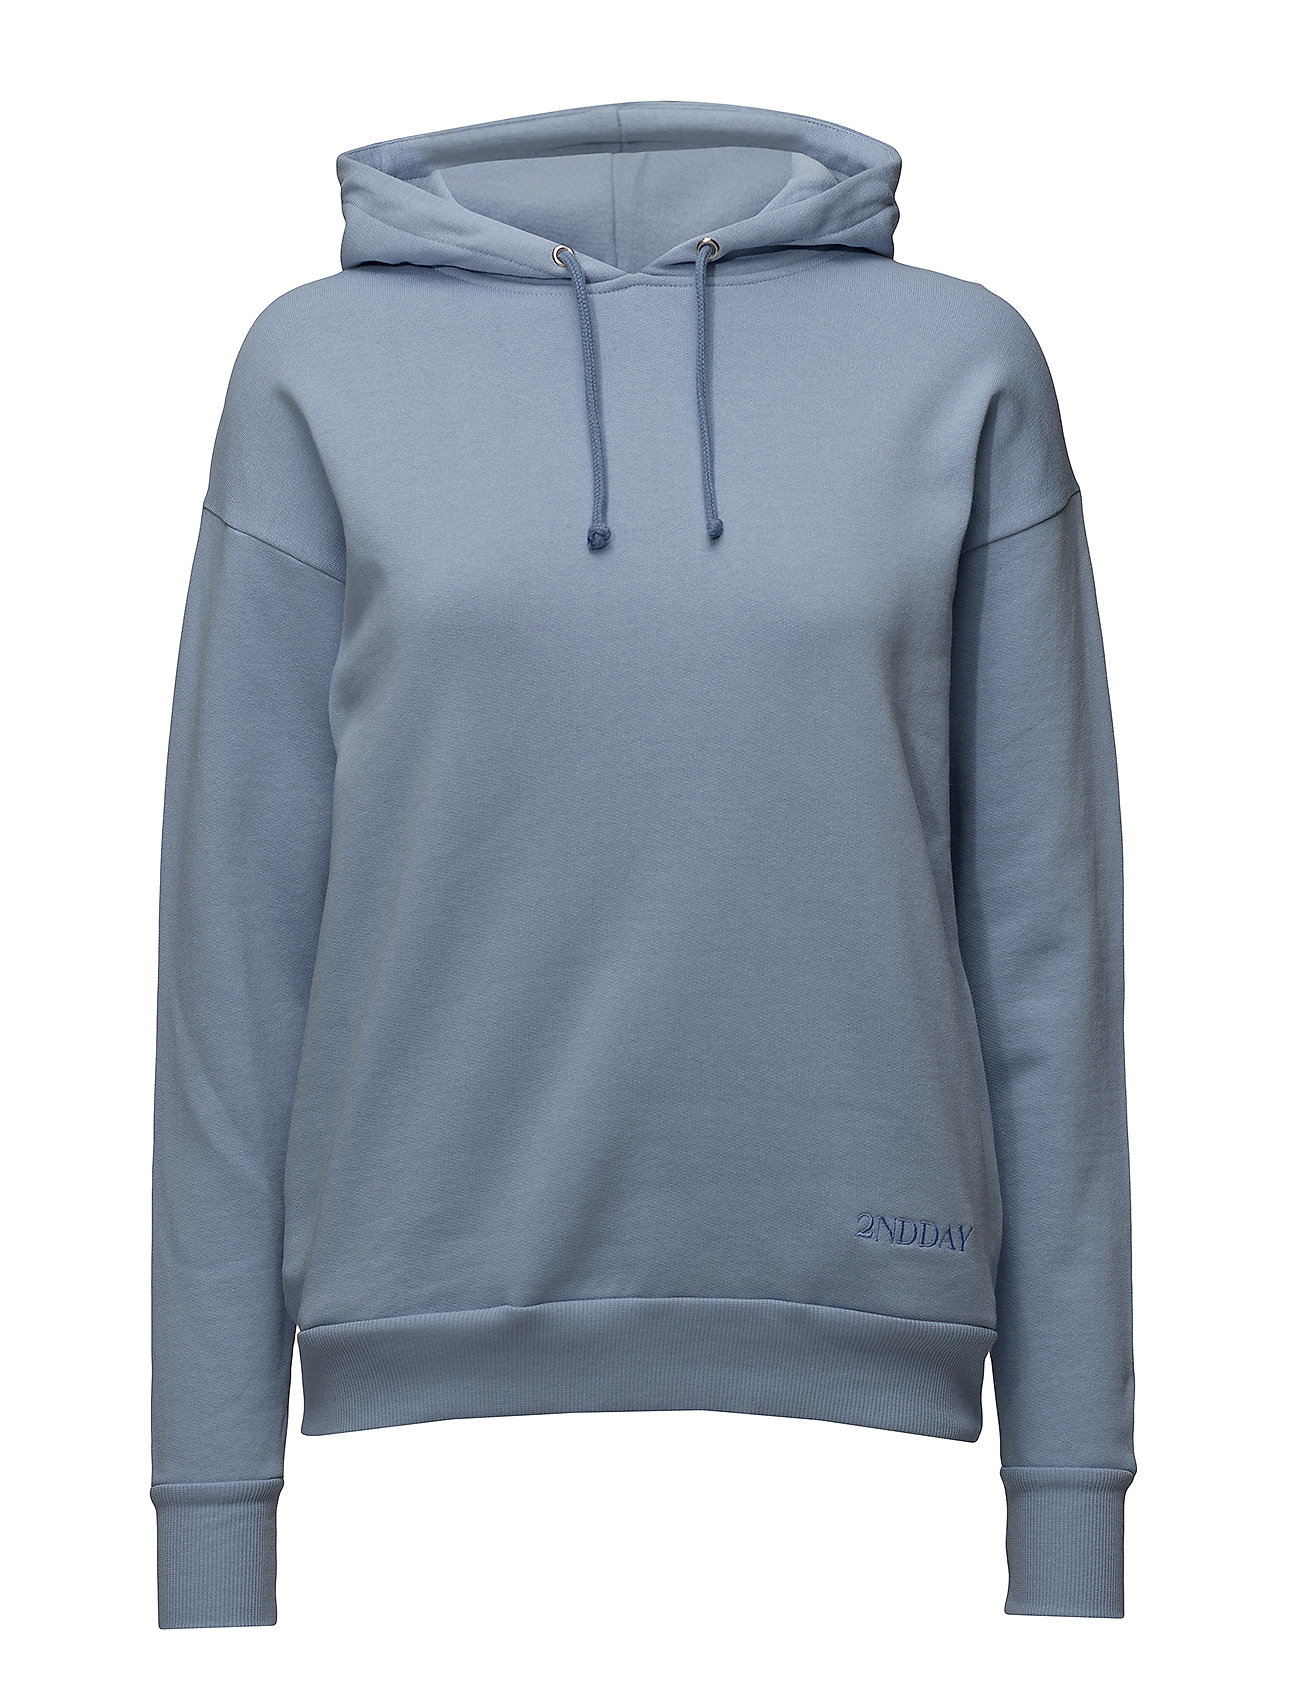 2NDDAY 2ND Shine hoodie